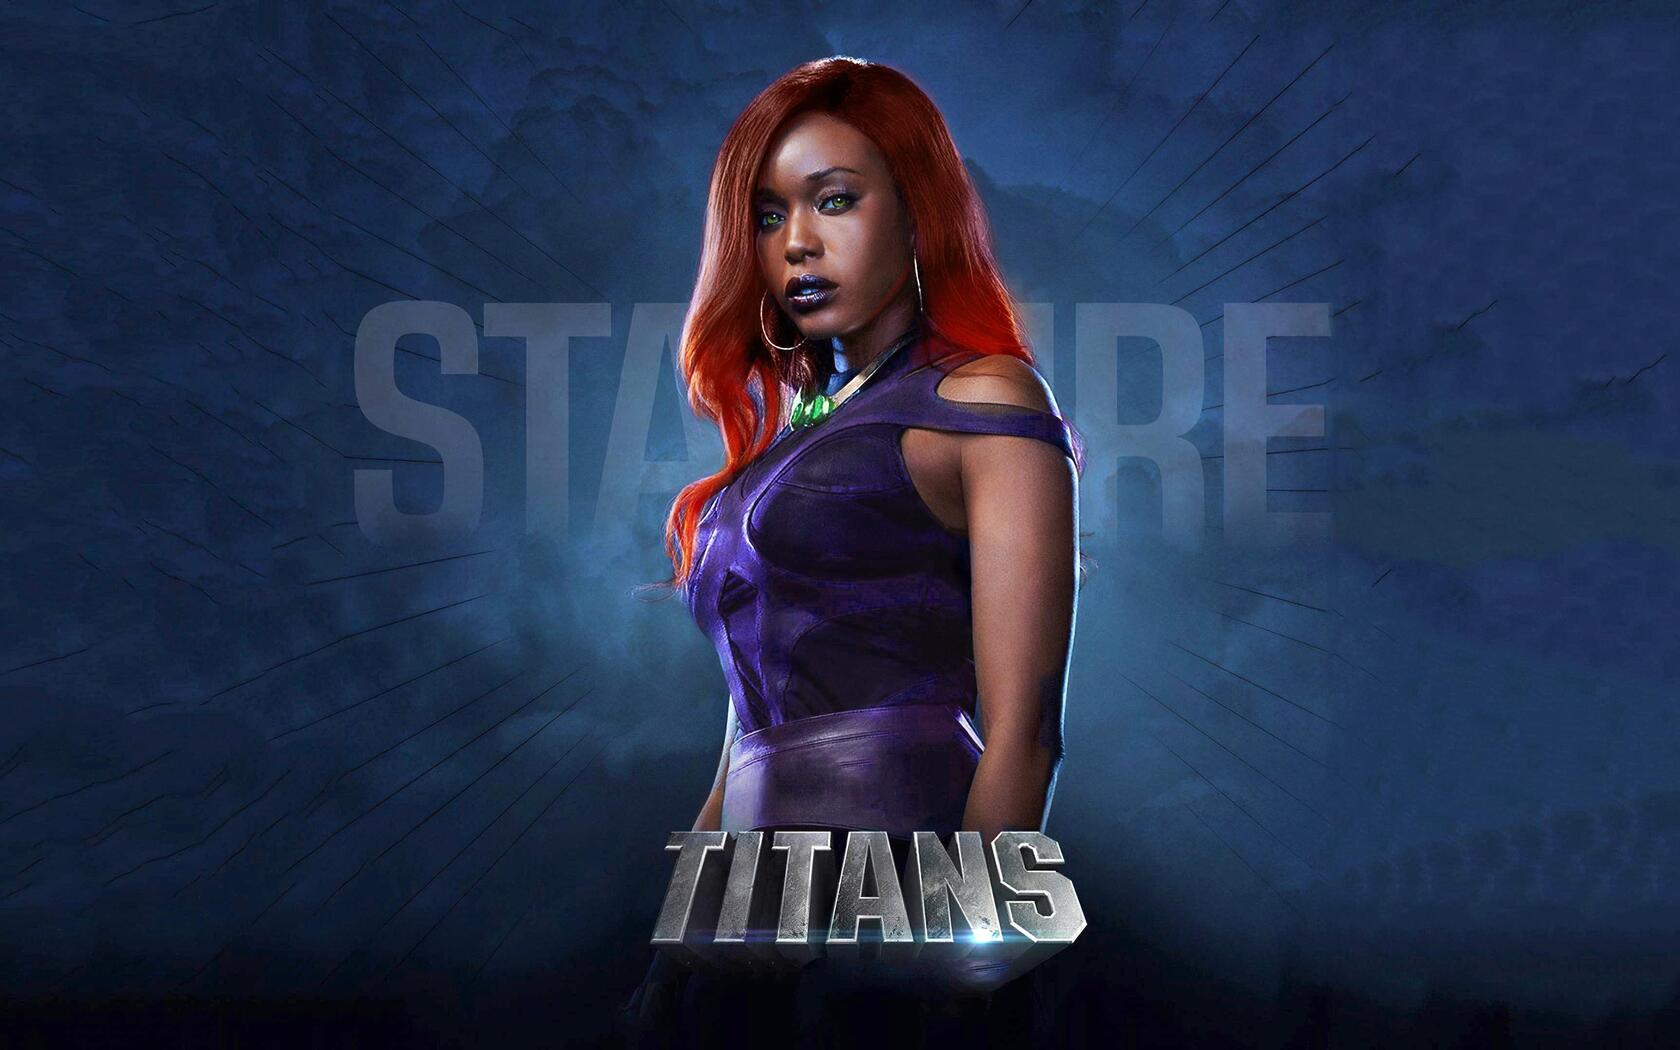 titans-2019-4k-starfire-rj.jpg